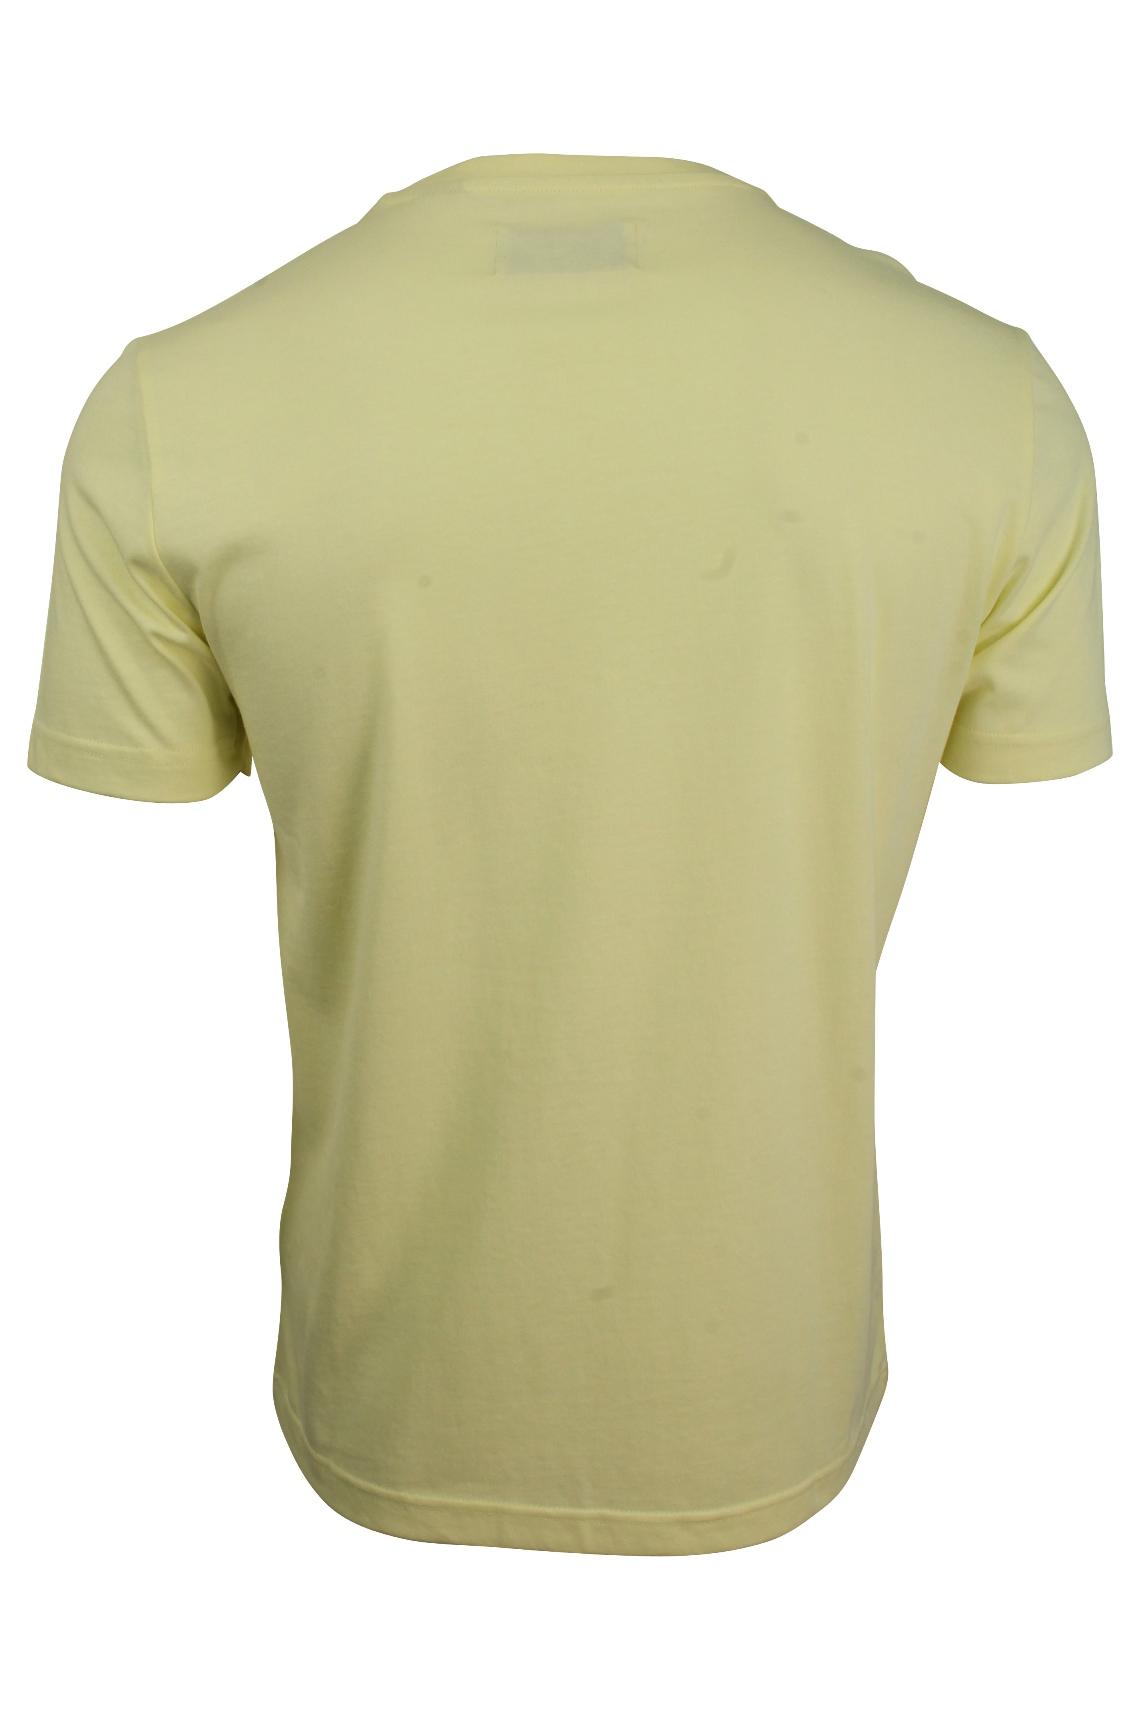 Mens-T-Shirt-by-Original-Penguin-Crew-Neck-Short-Sleeved thumbnail 50